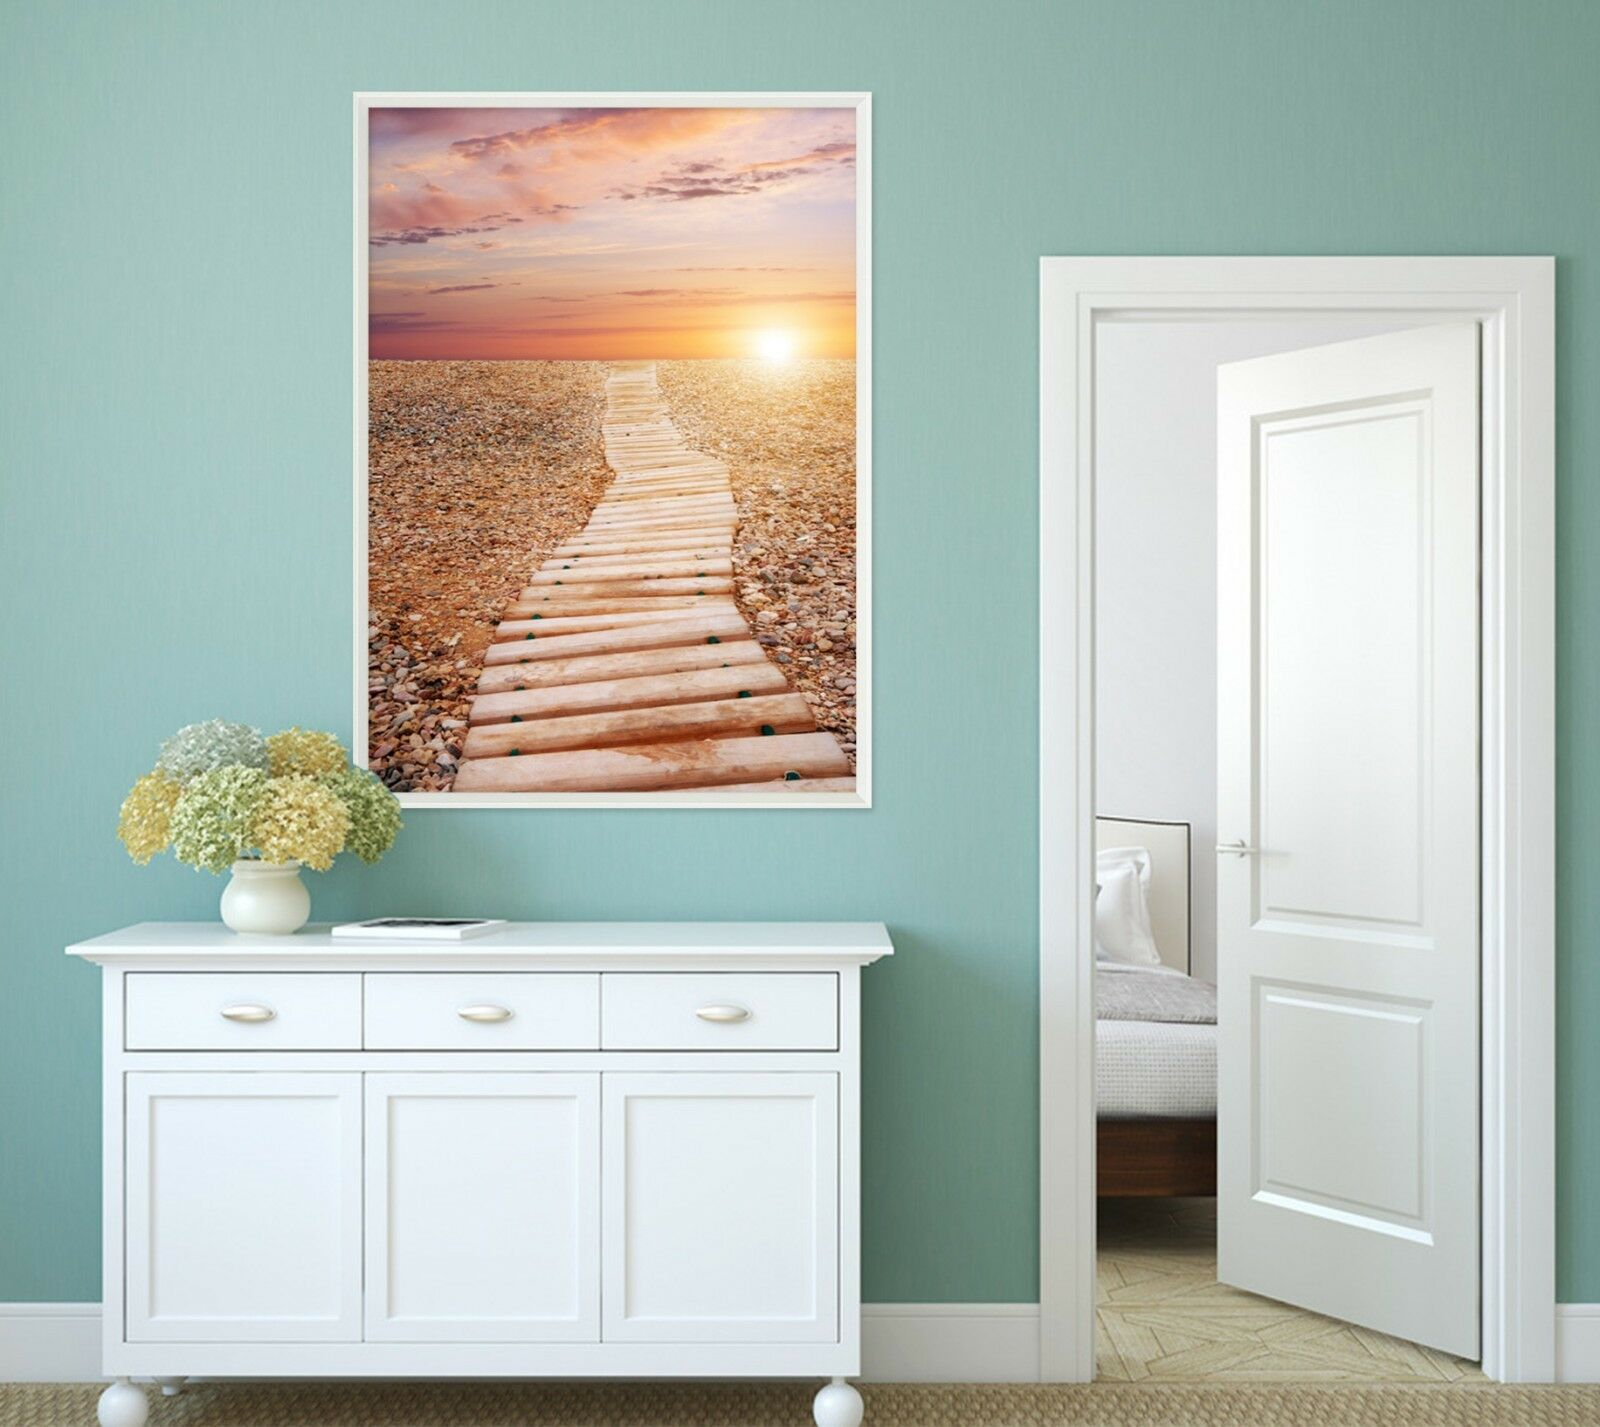 3D Sunlight Aisle 665 Fake Framed Poster Home Decor Print Painting Unique Art